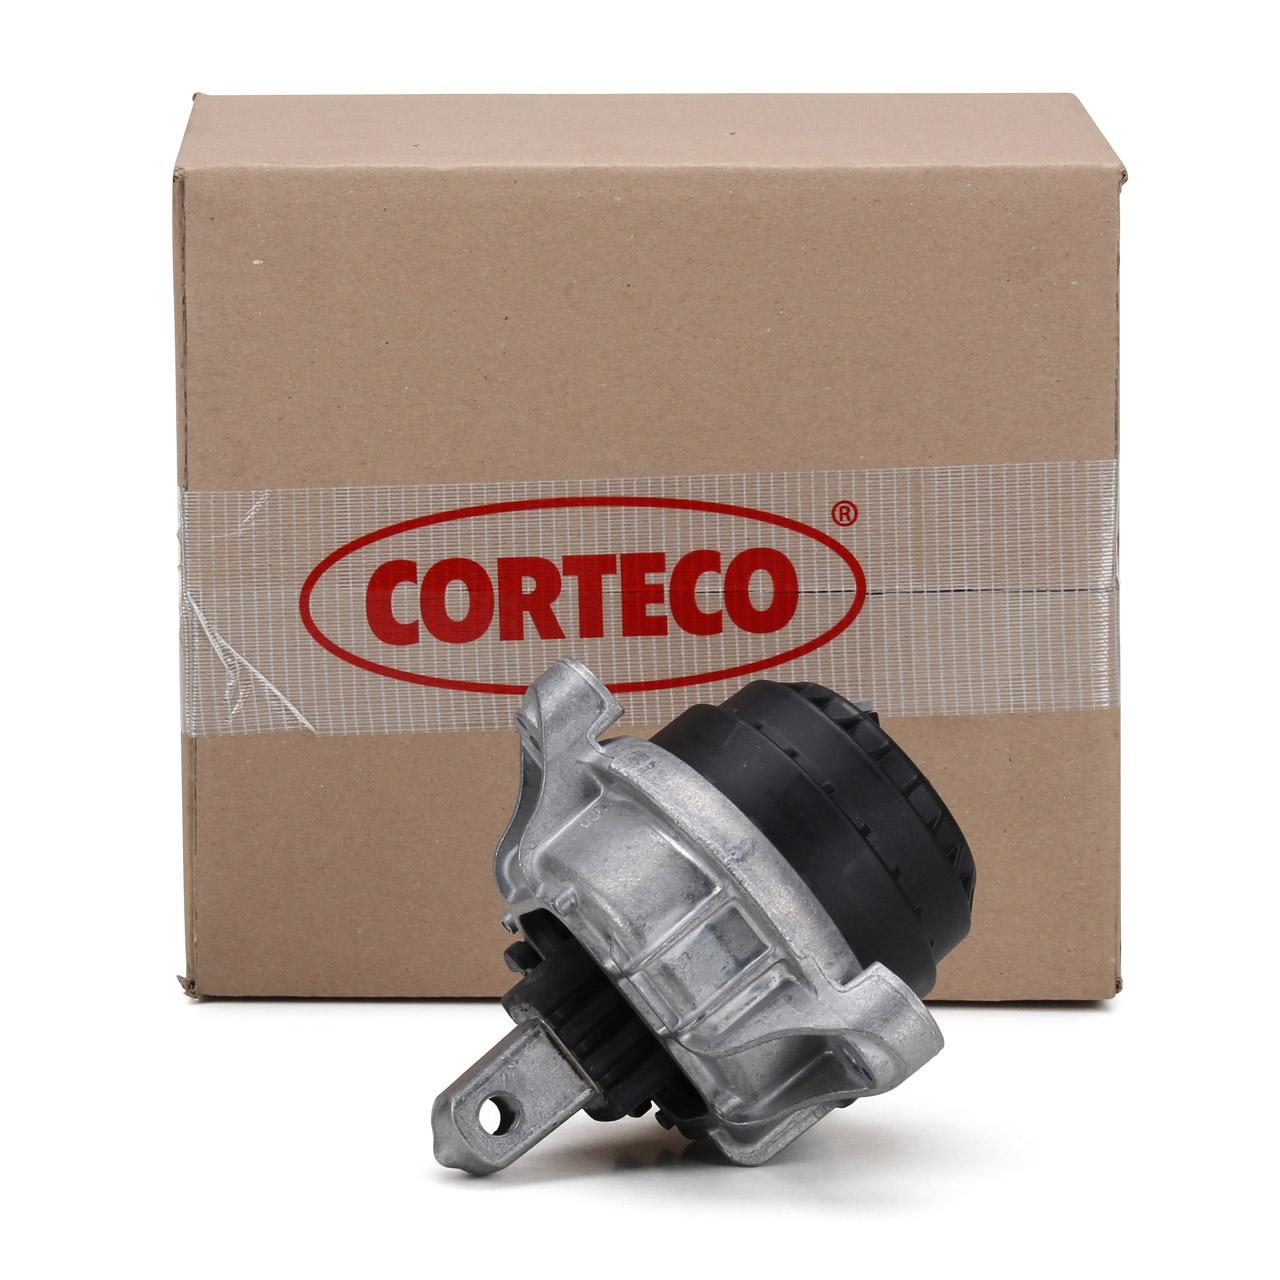 CORTECO 80004460 Motorlager Hydrolager BMW 5er F10/11 520d 525d B47 N47 rechts 22117935142